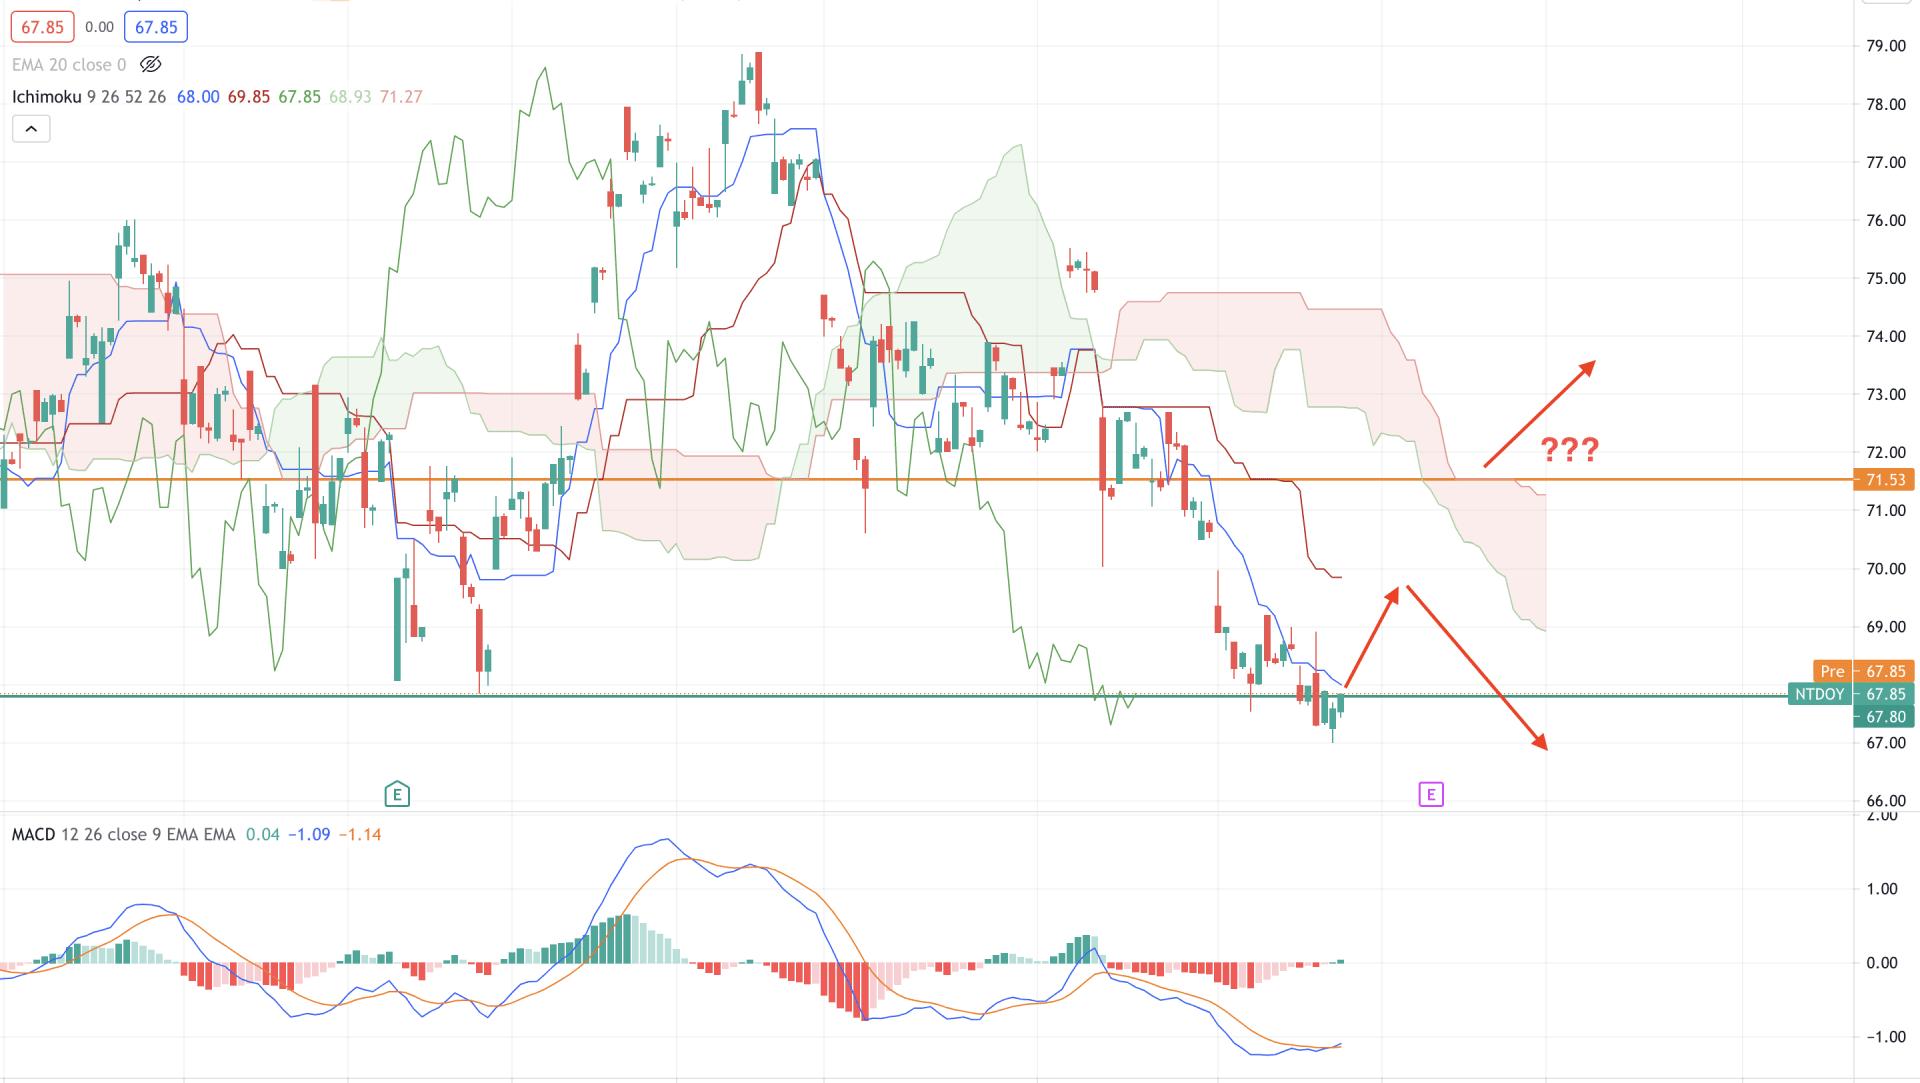 Nintendo Stock H4 Technical Analysis 29 July 2021